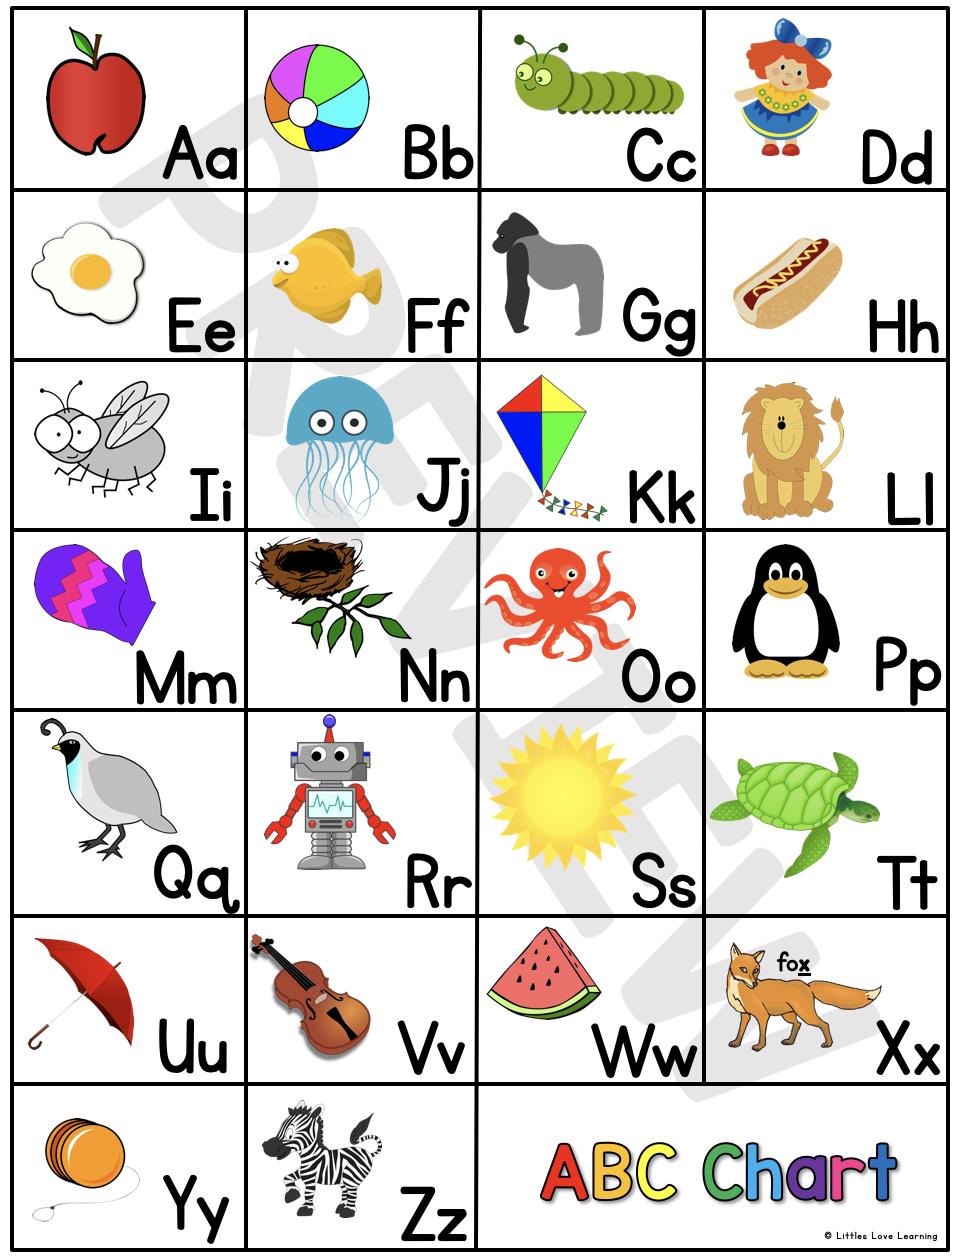 Free Preschool Kindergarten Abc Flashcards Printable Chart Abc Flashcards Kindergarten Abc Preschool Letters Printables